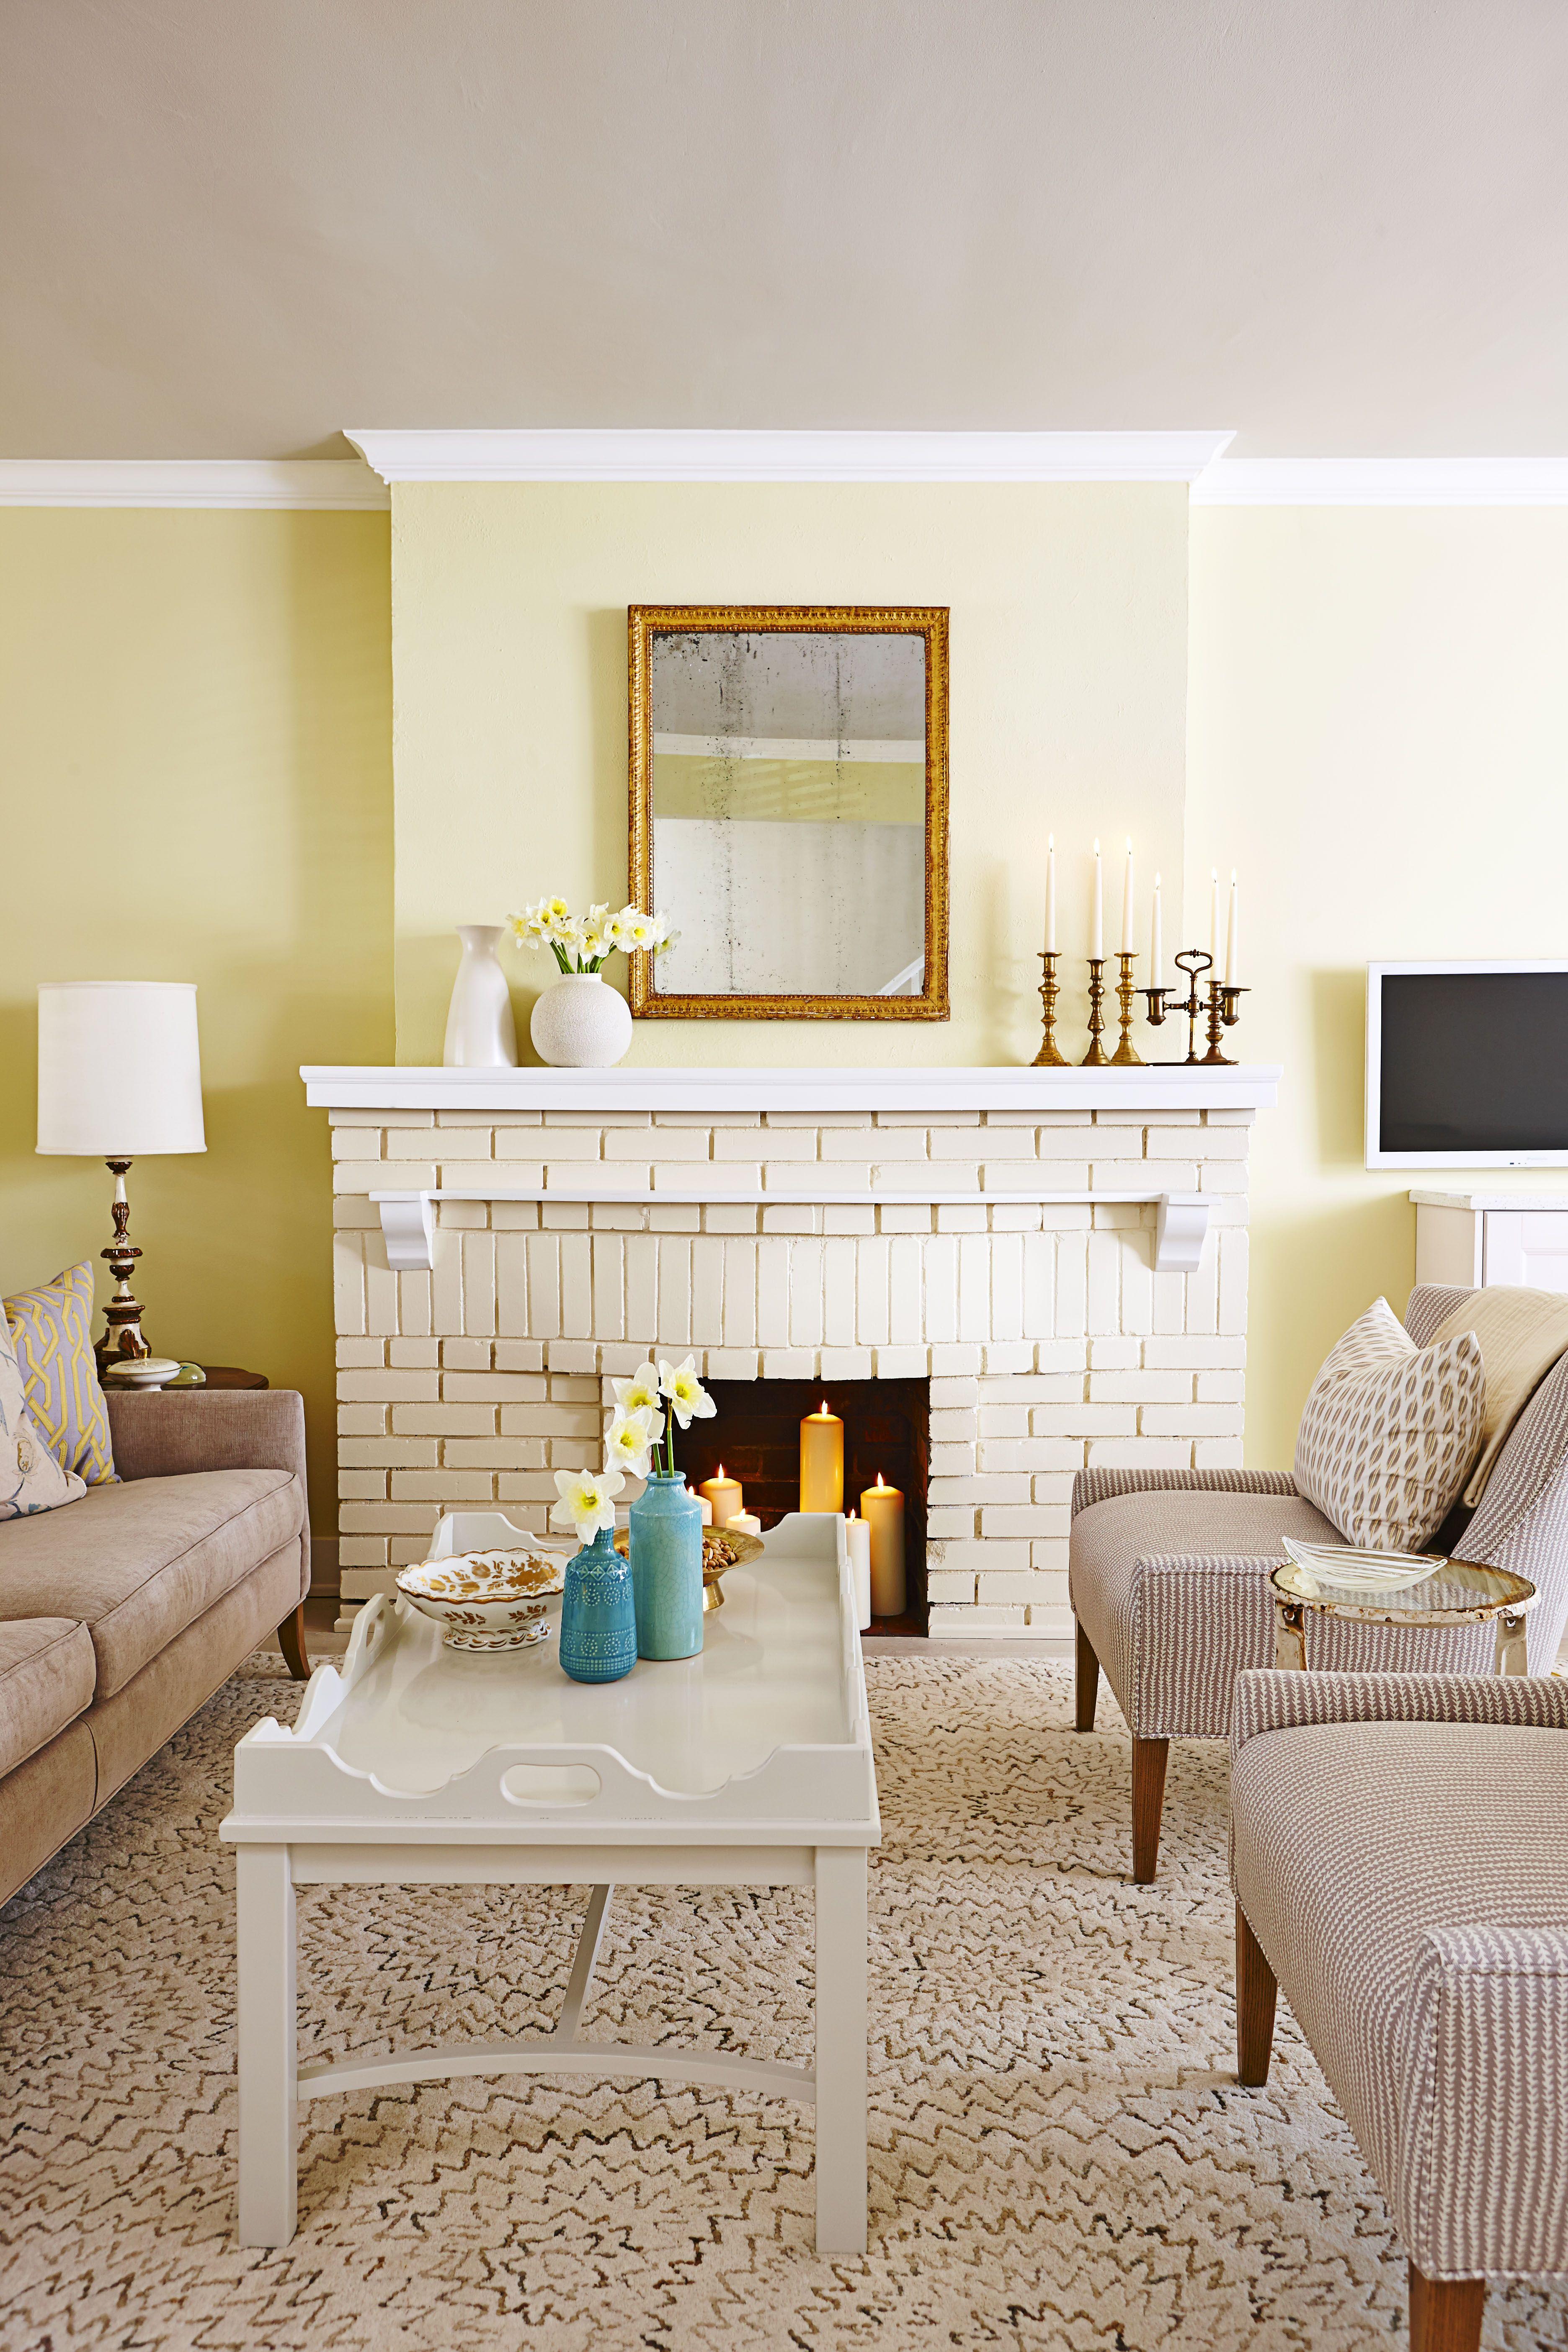 Amazing Decorative Ideas For Living Room Minimalist